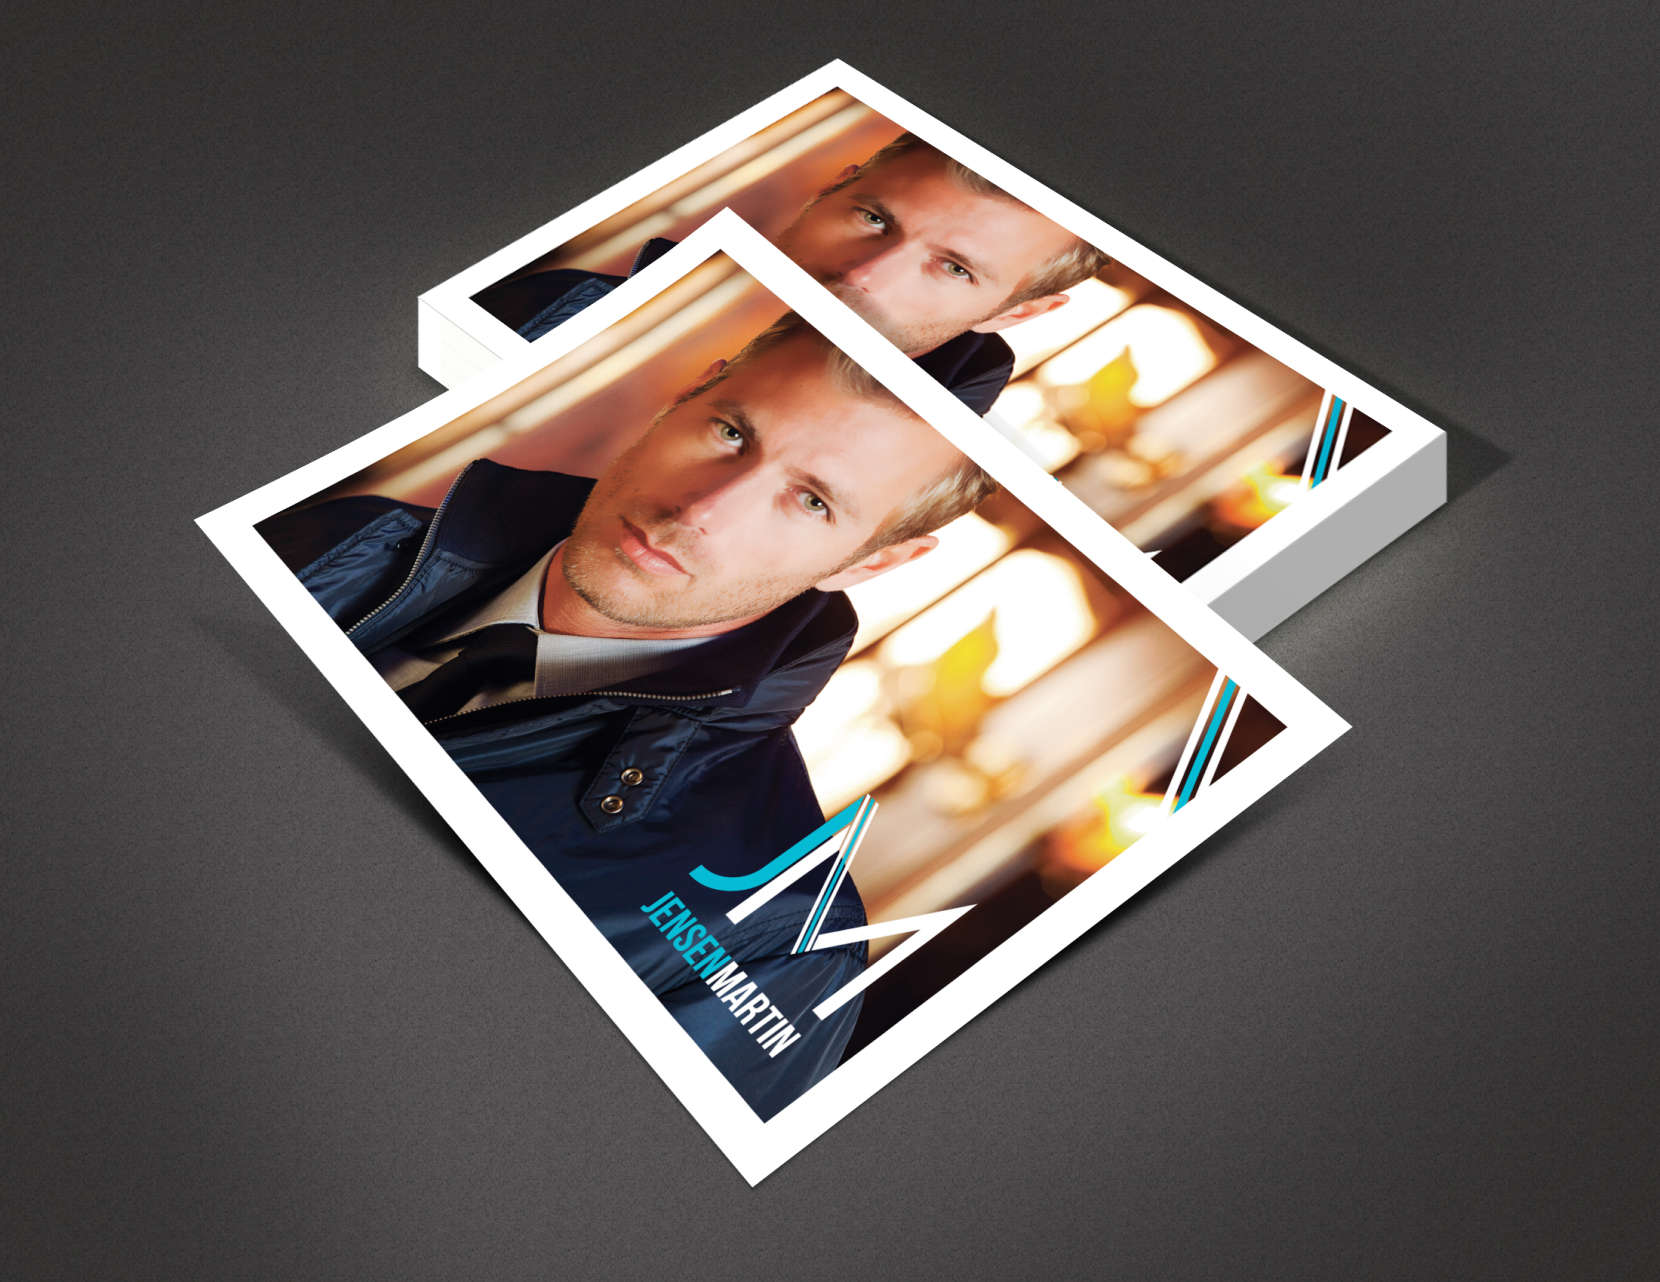 01_Flyer-mockup2-jm-1660x1282.jpg